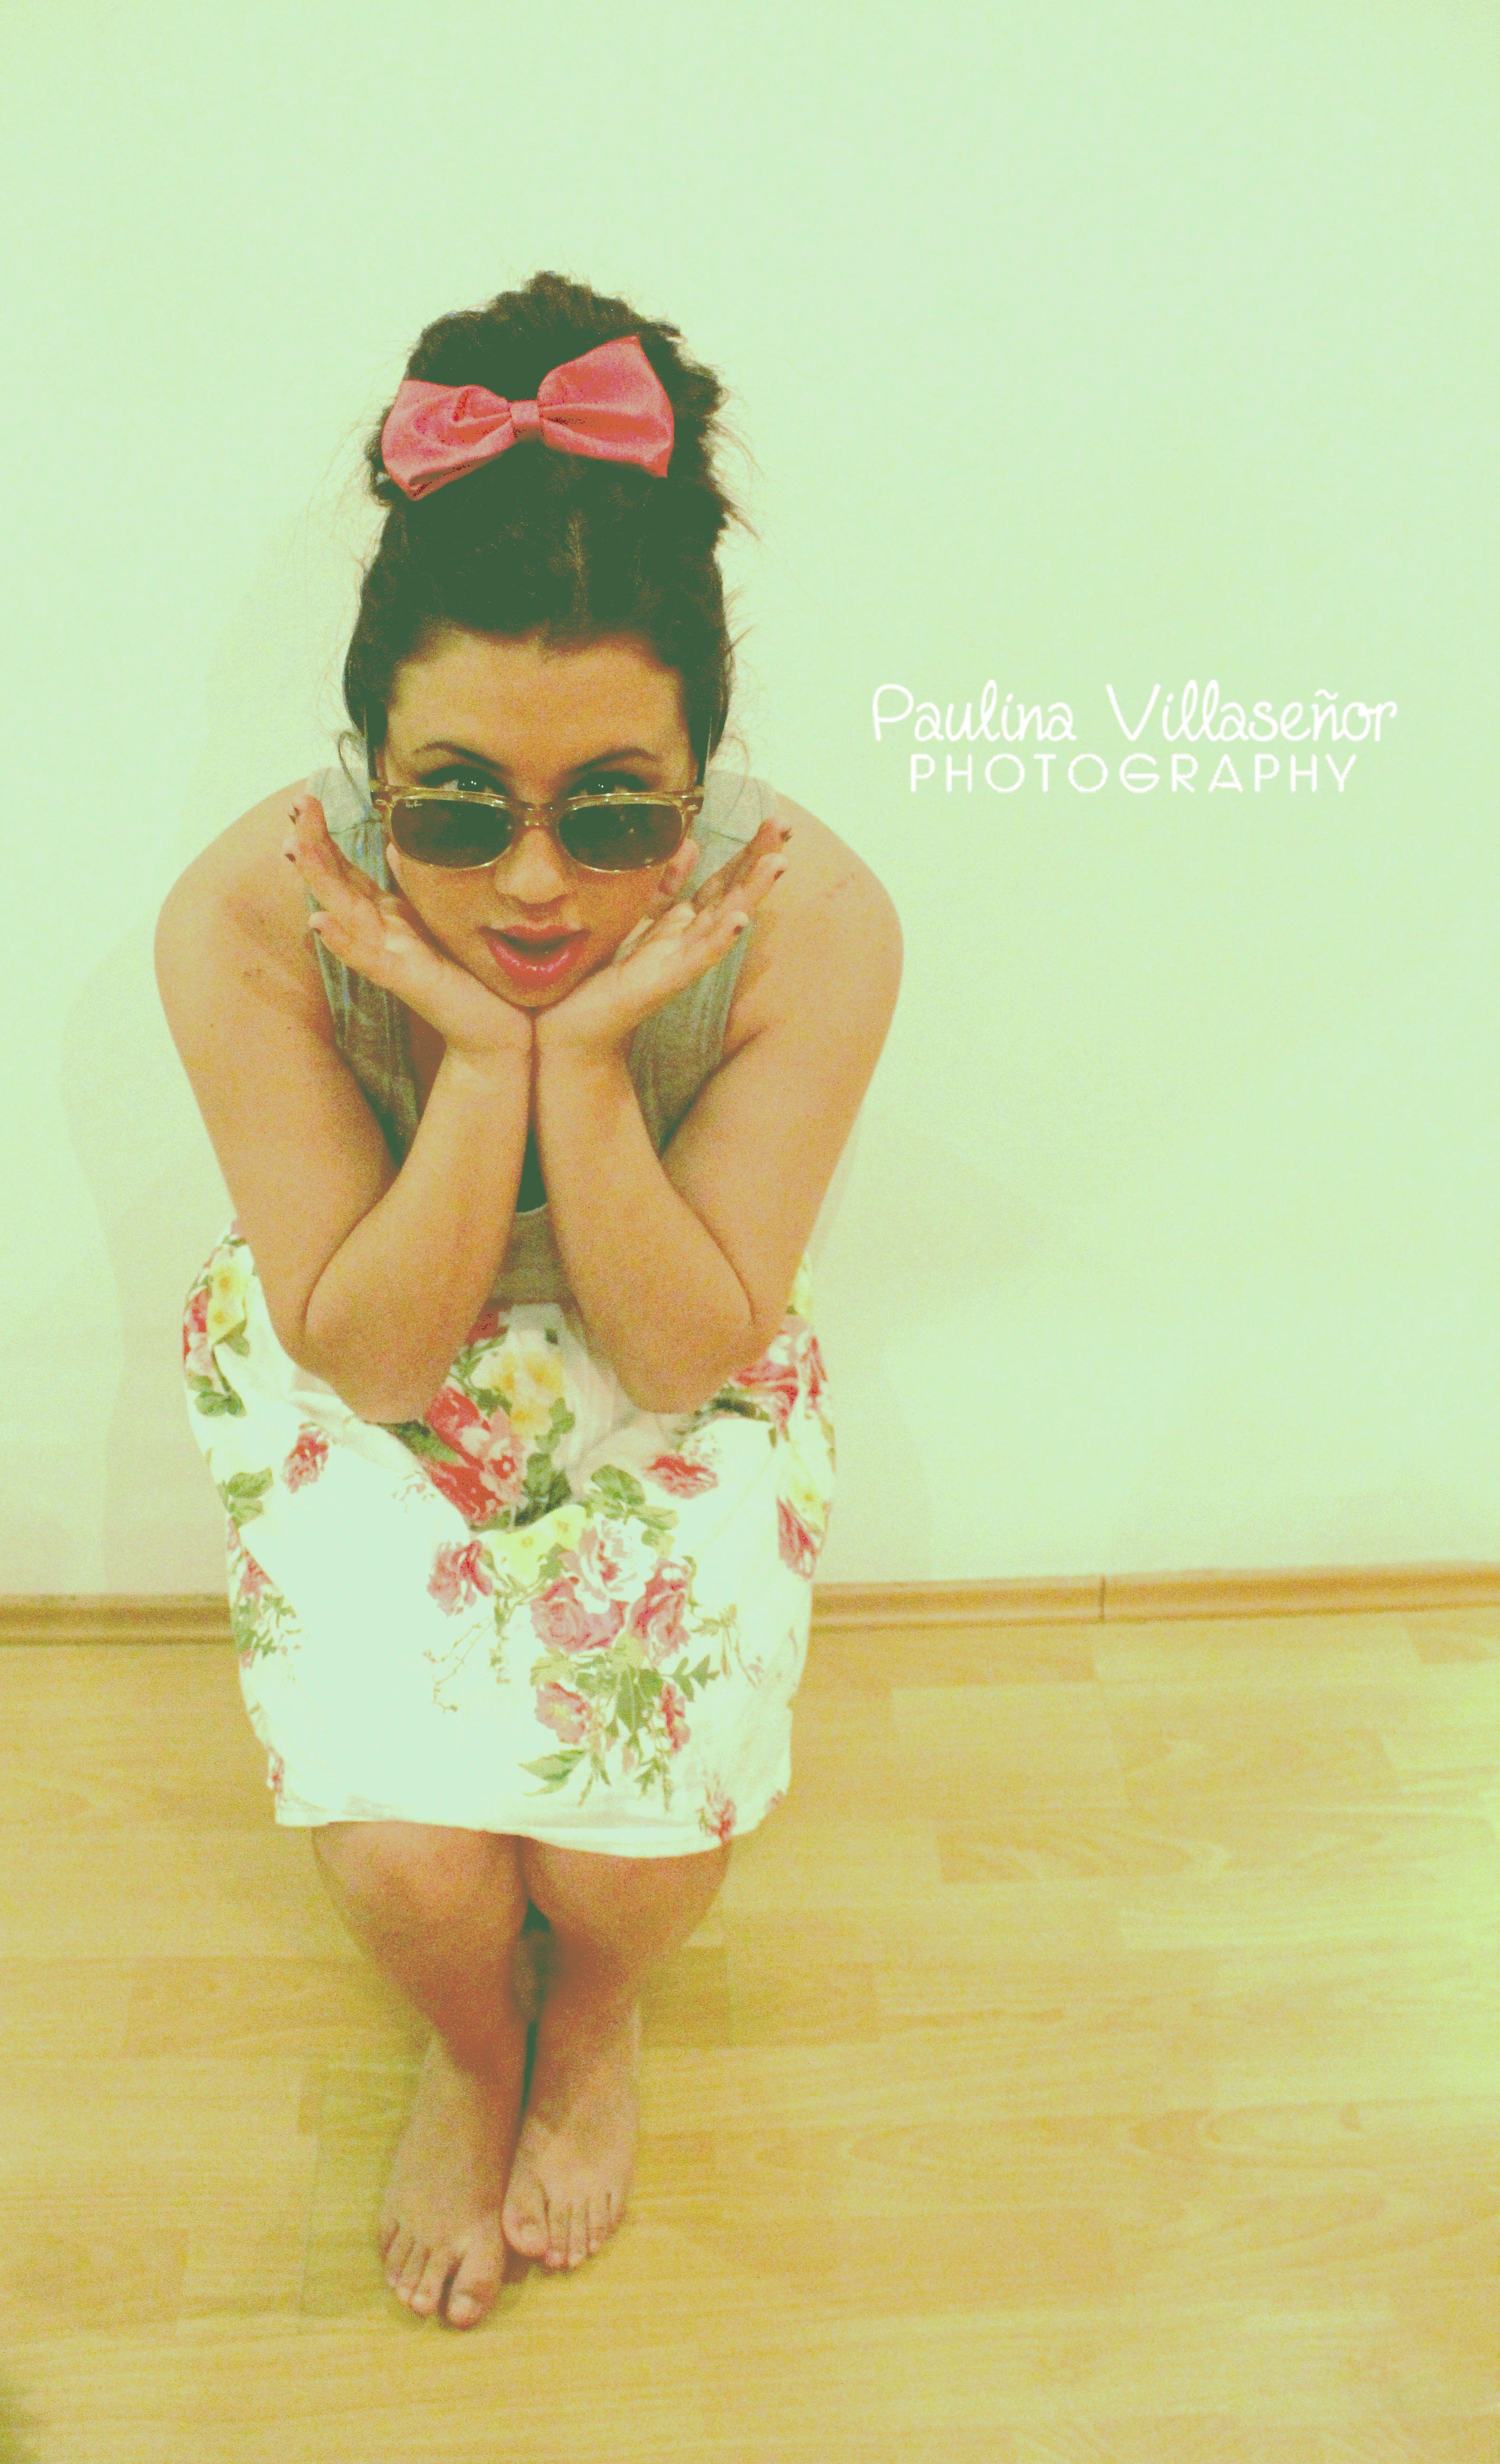 Copyright © Paulina Villaseñor Photography